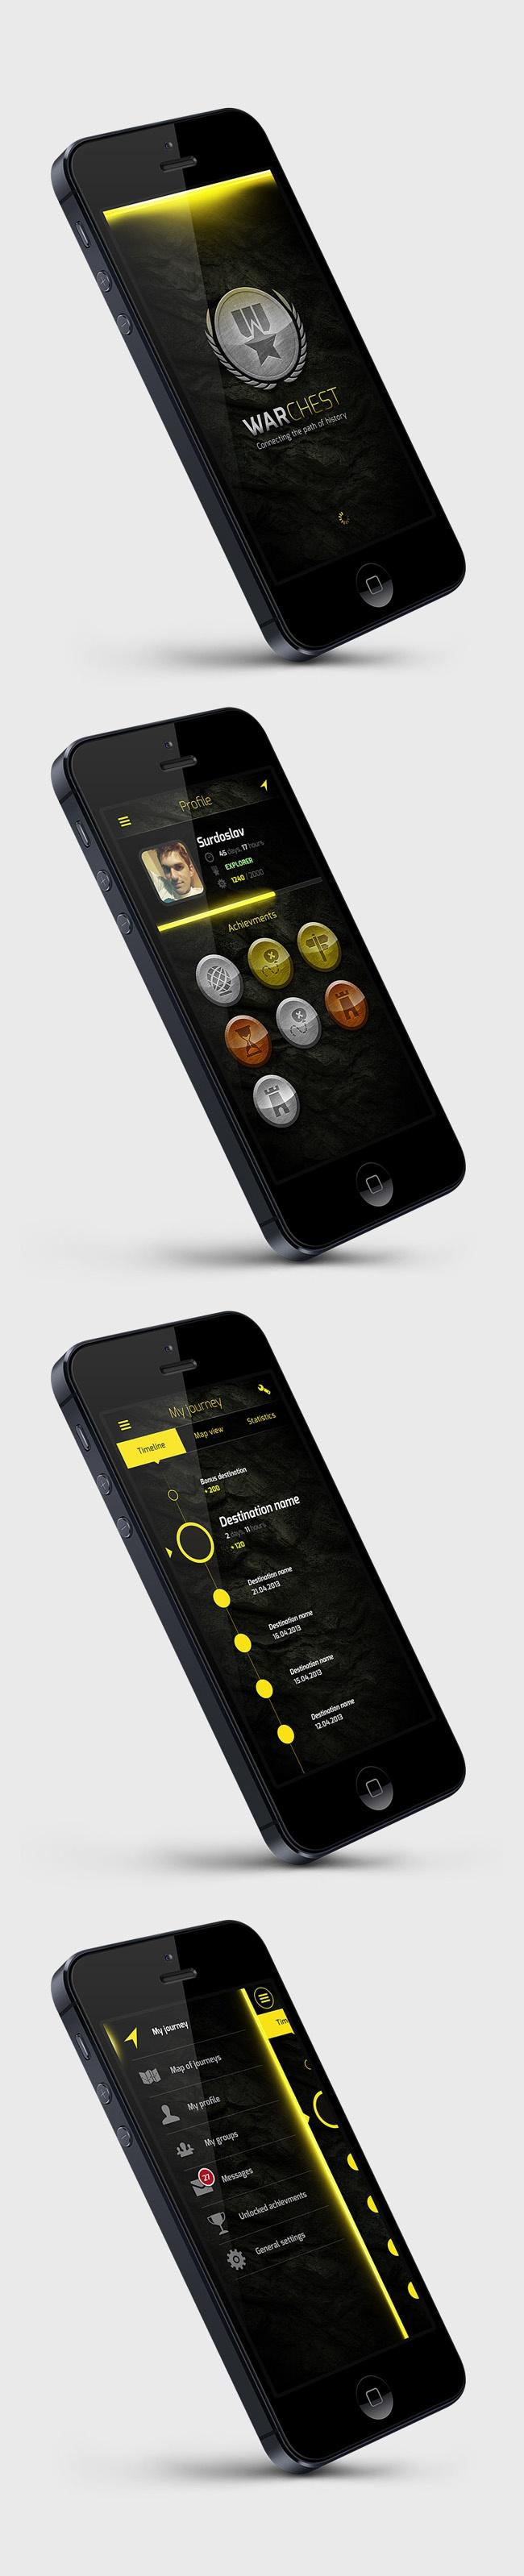 WarChest  Study by Martin Schurdak, via Behance *** few screens of a touristic app